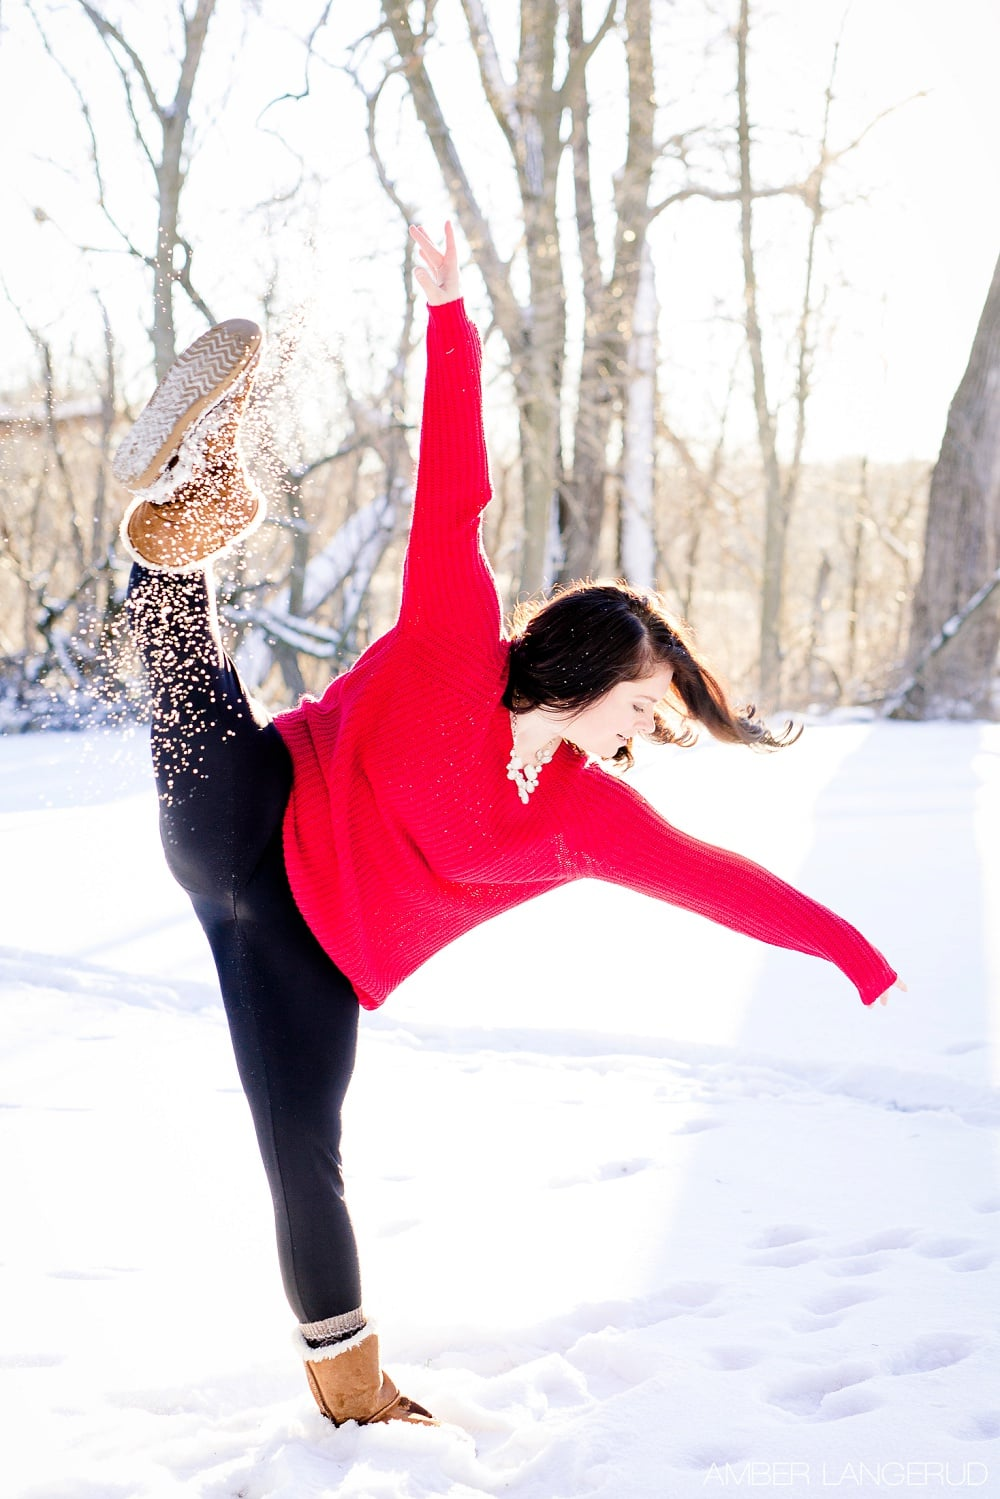 Audubon, MN Outdoor Winter Portraits | Red Sweater & Snow & Dance